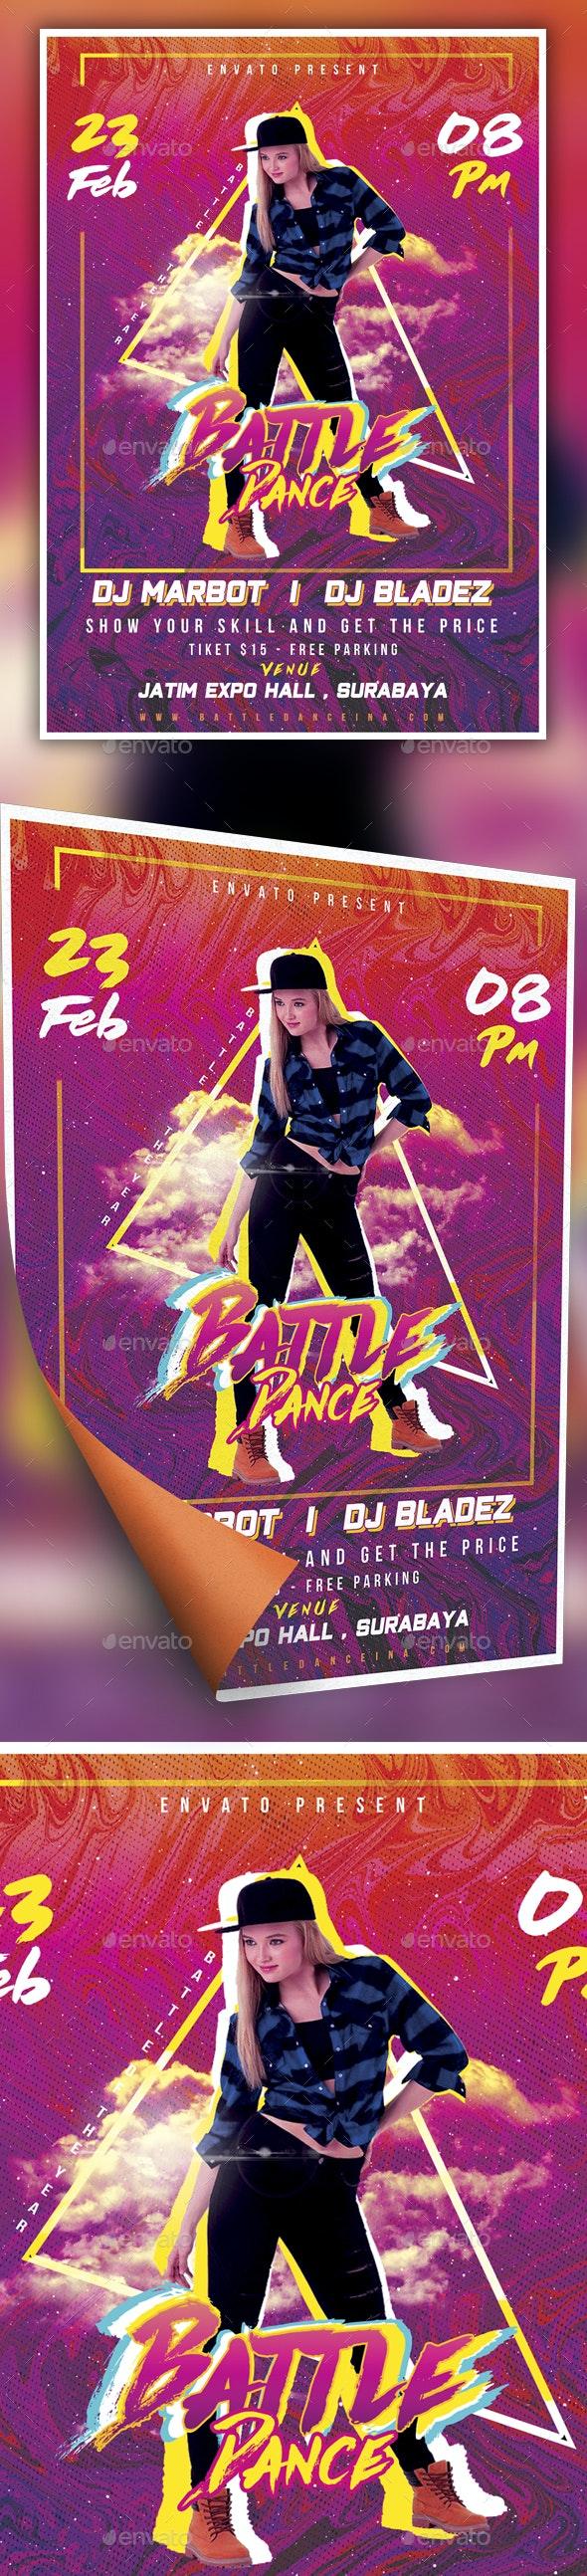 Battle Dance Purple Festival Flyer - Events Flyers